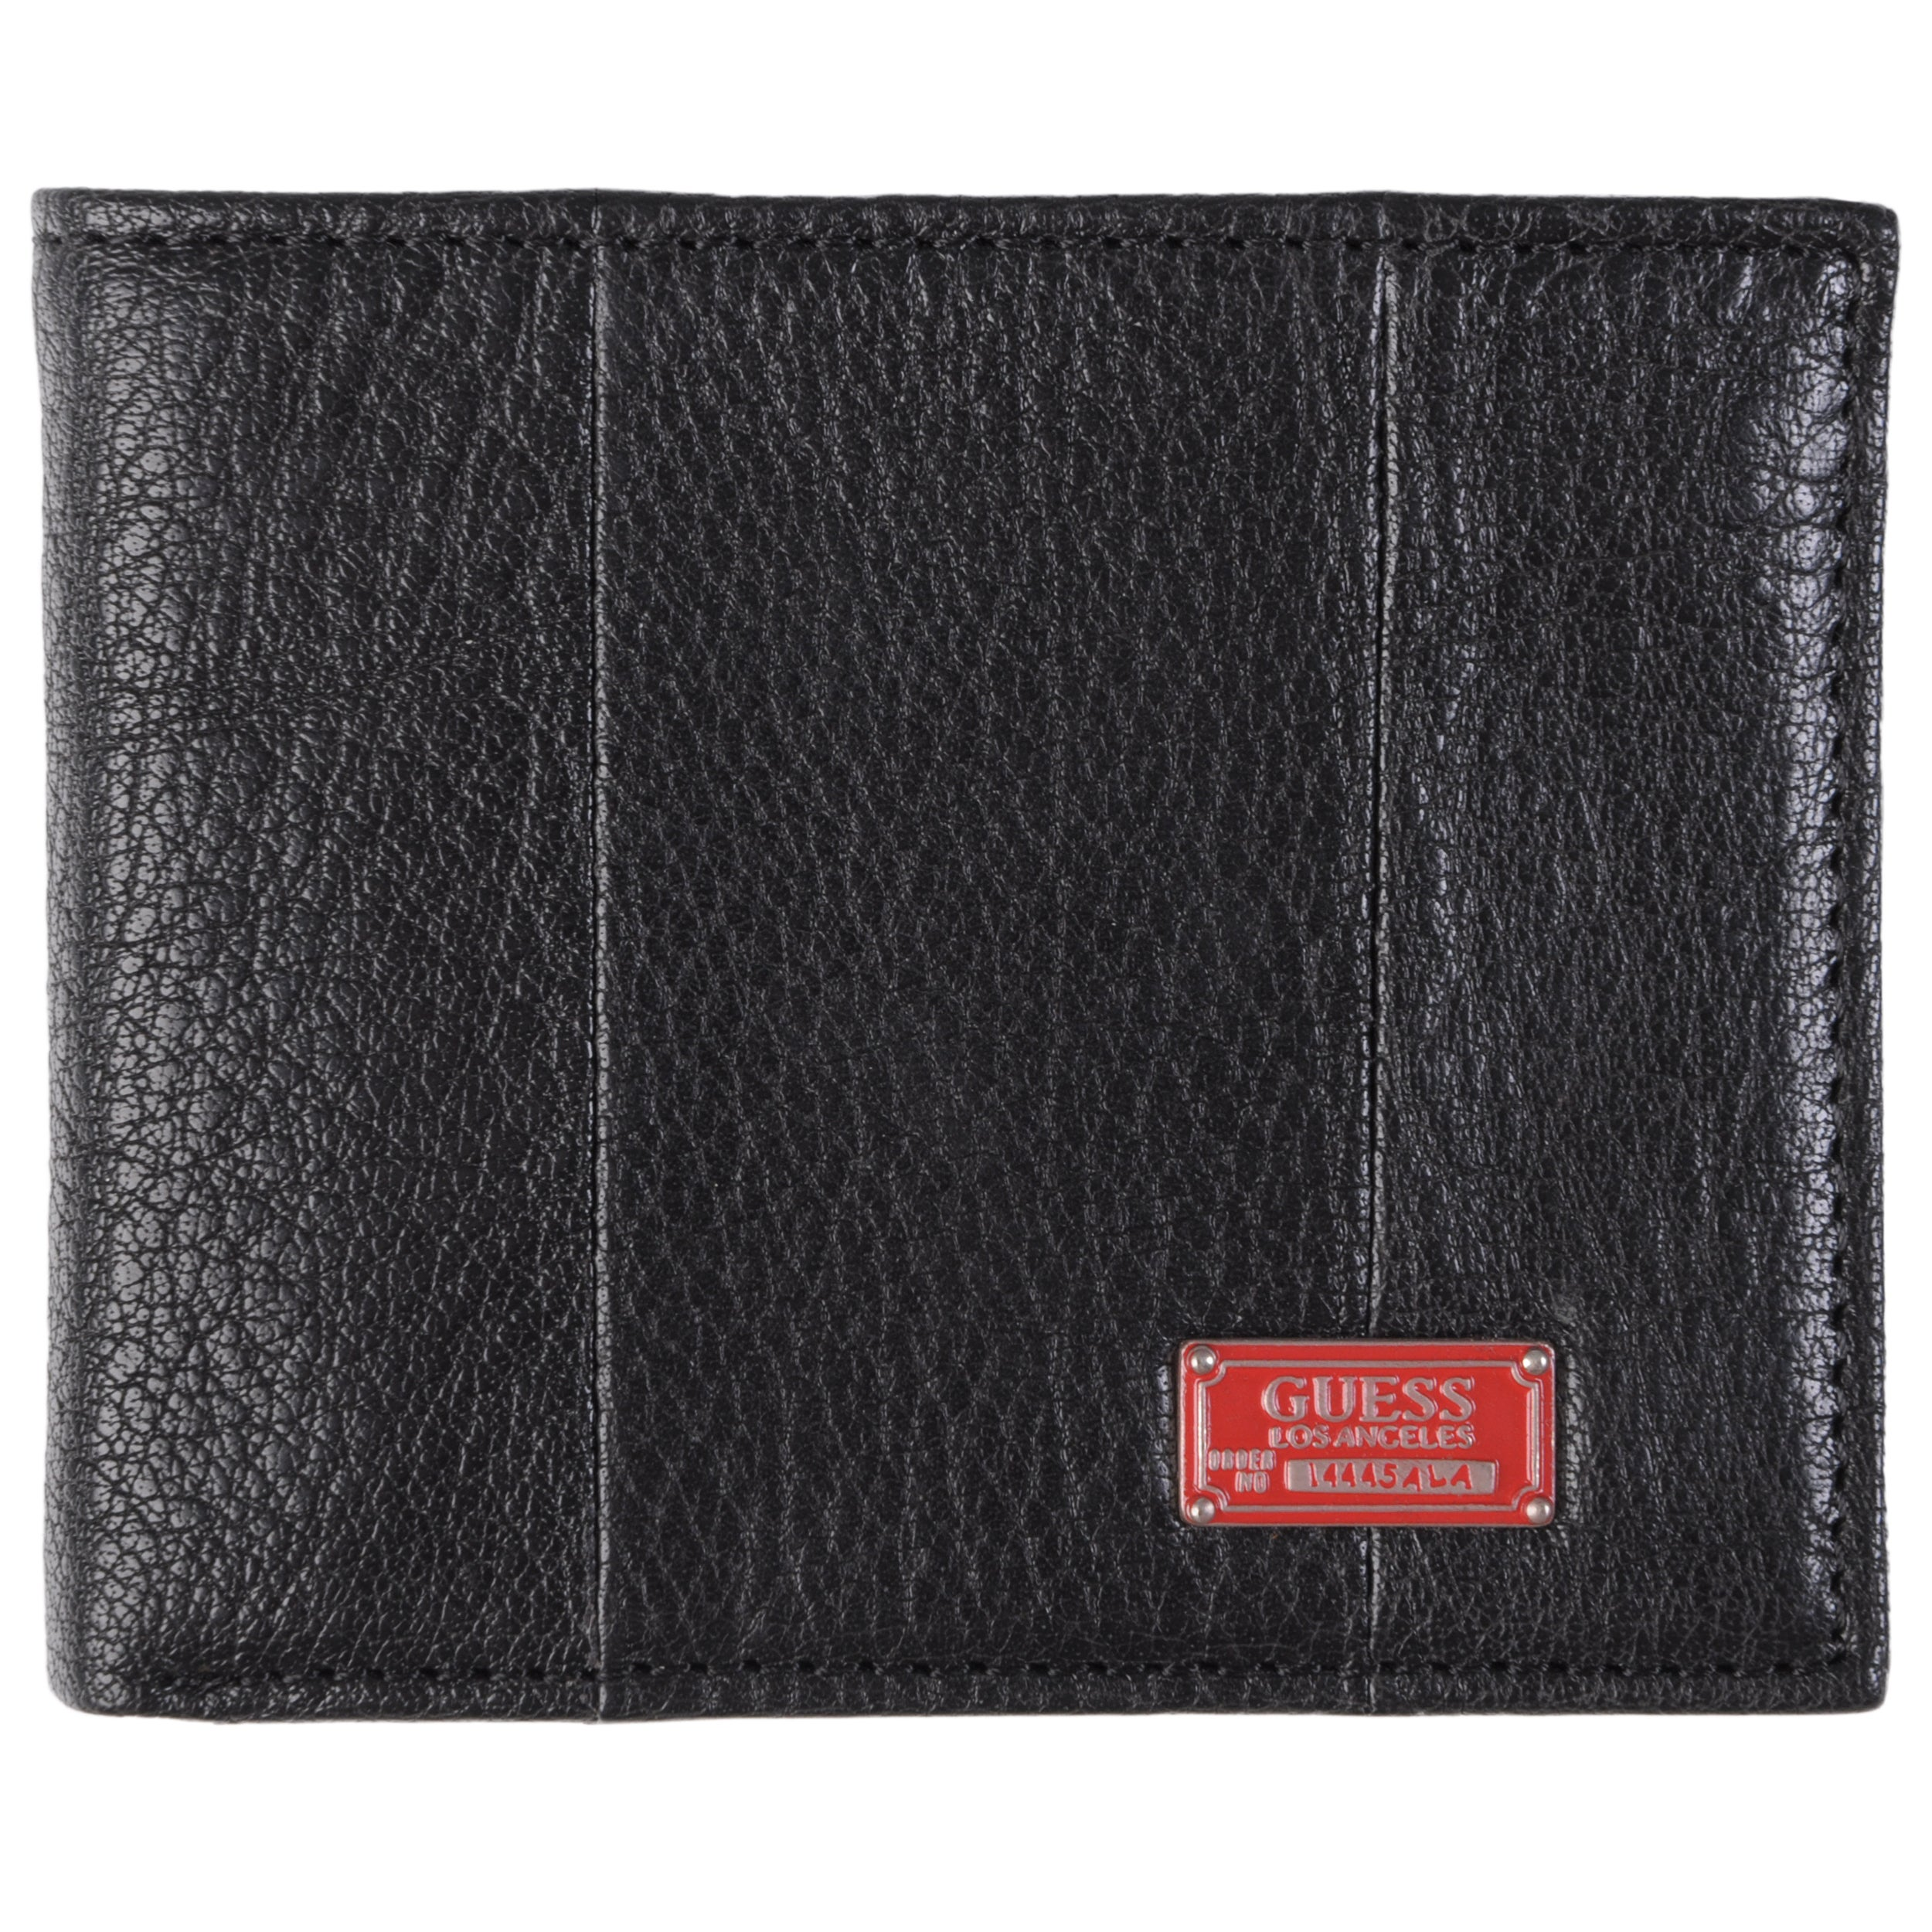 Guess Men's Genuine Leather Bifold Zipper Wallet